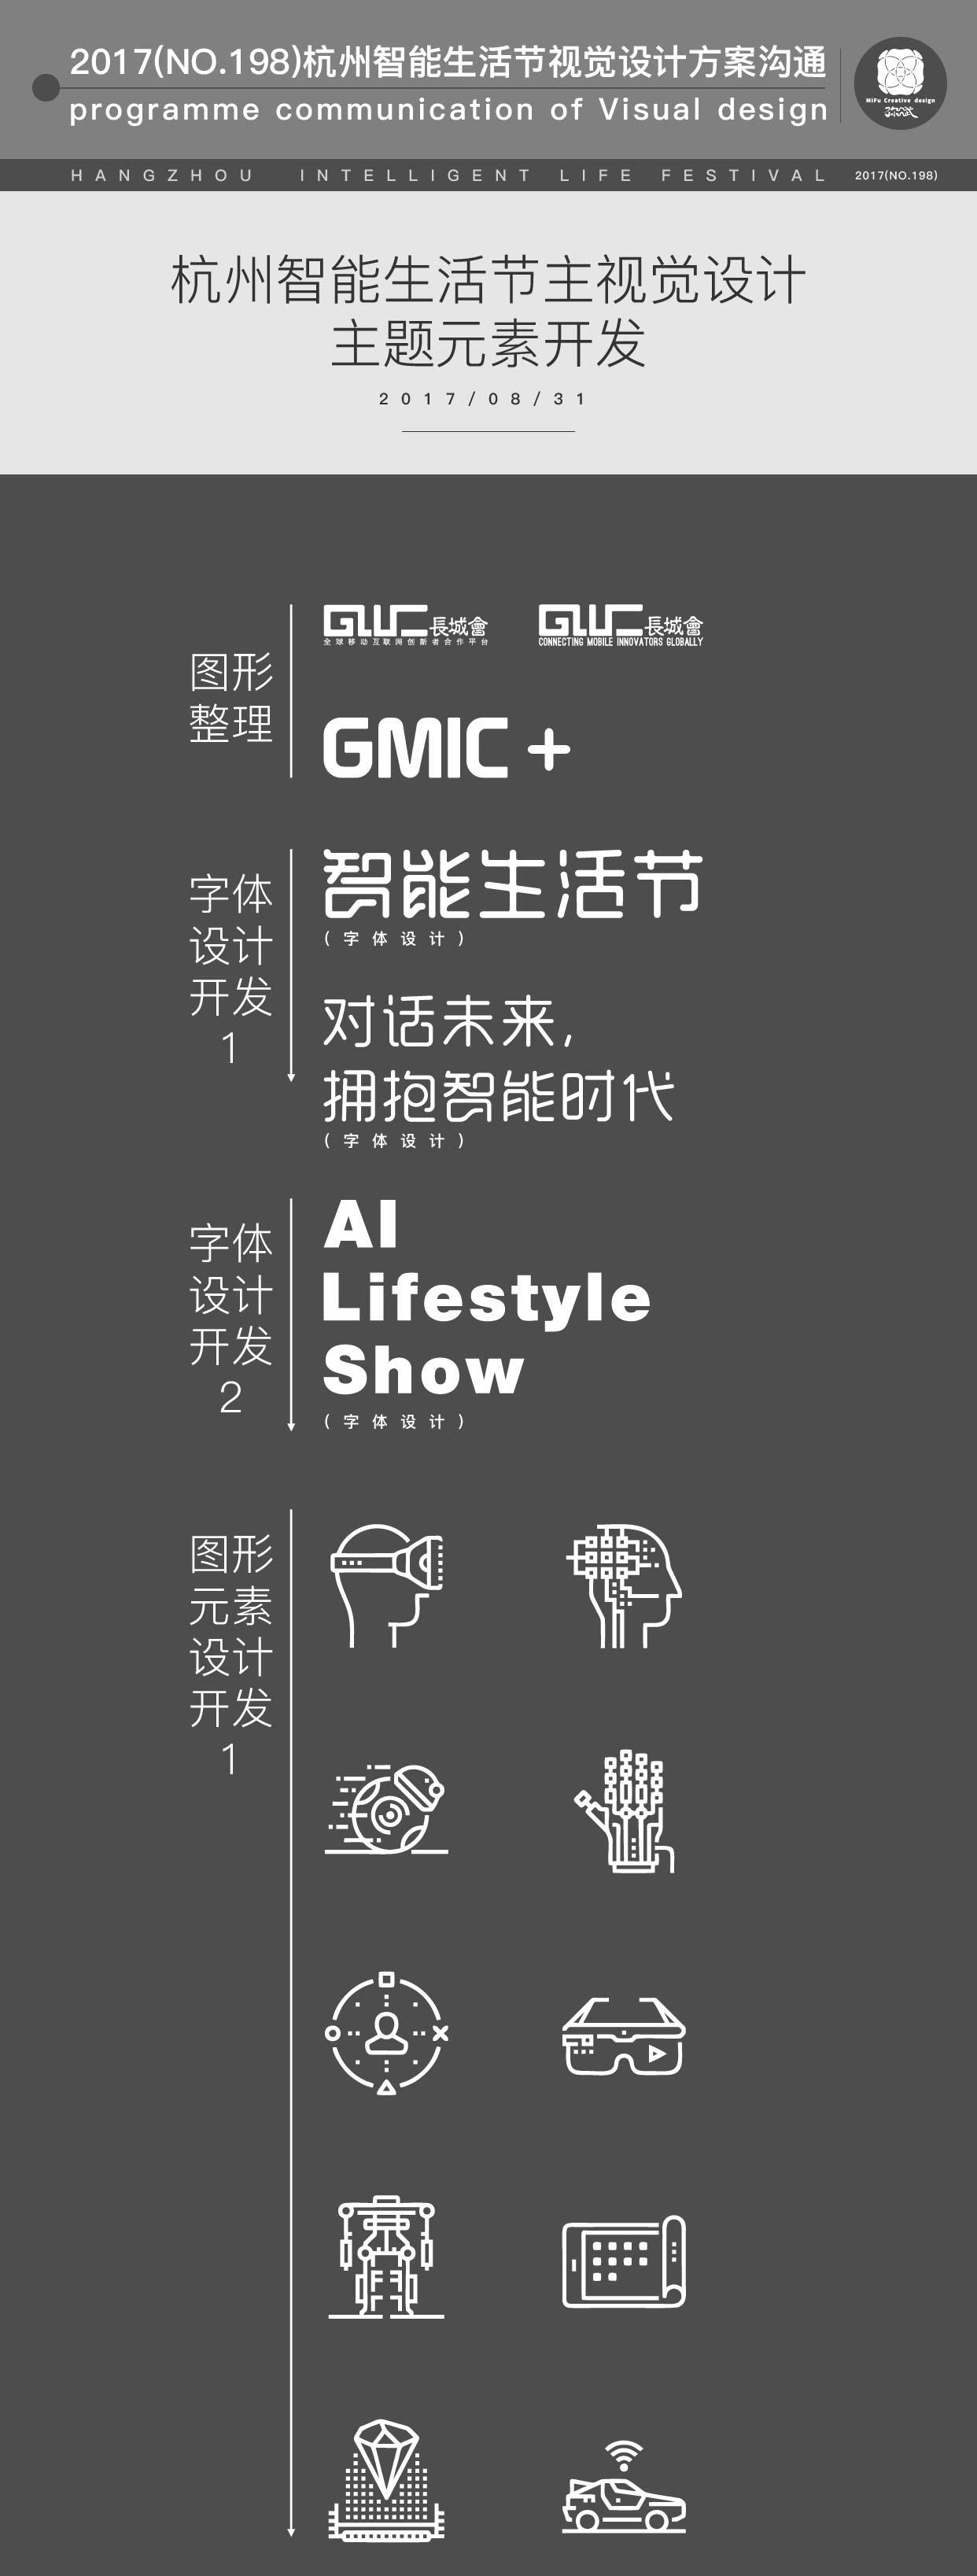 GMIC+杭州智能生活节KV视觉C